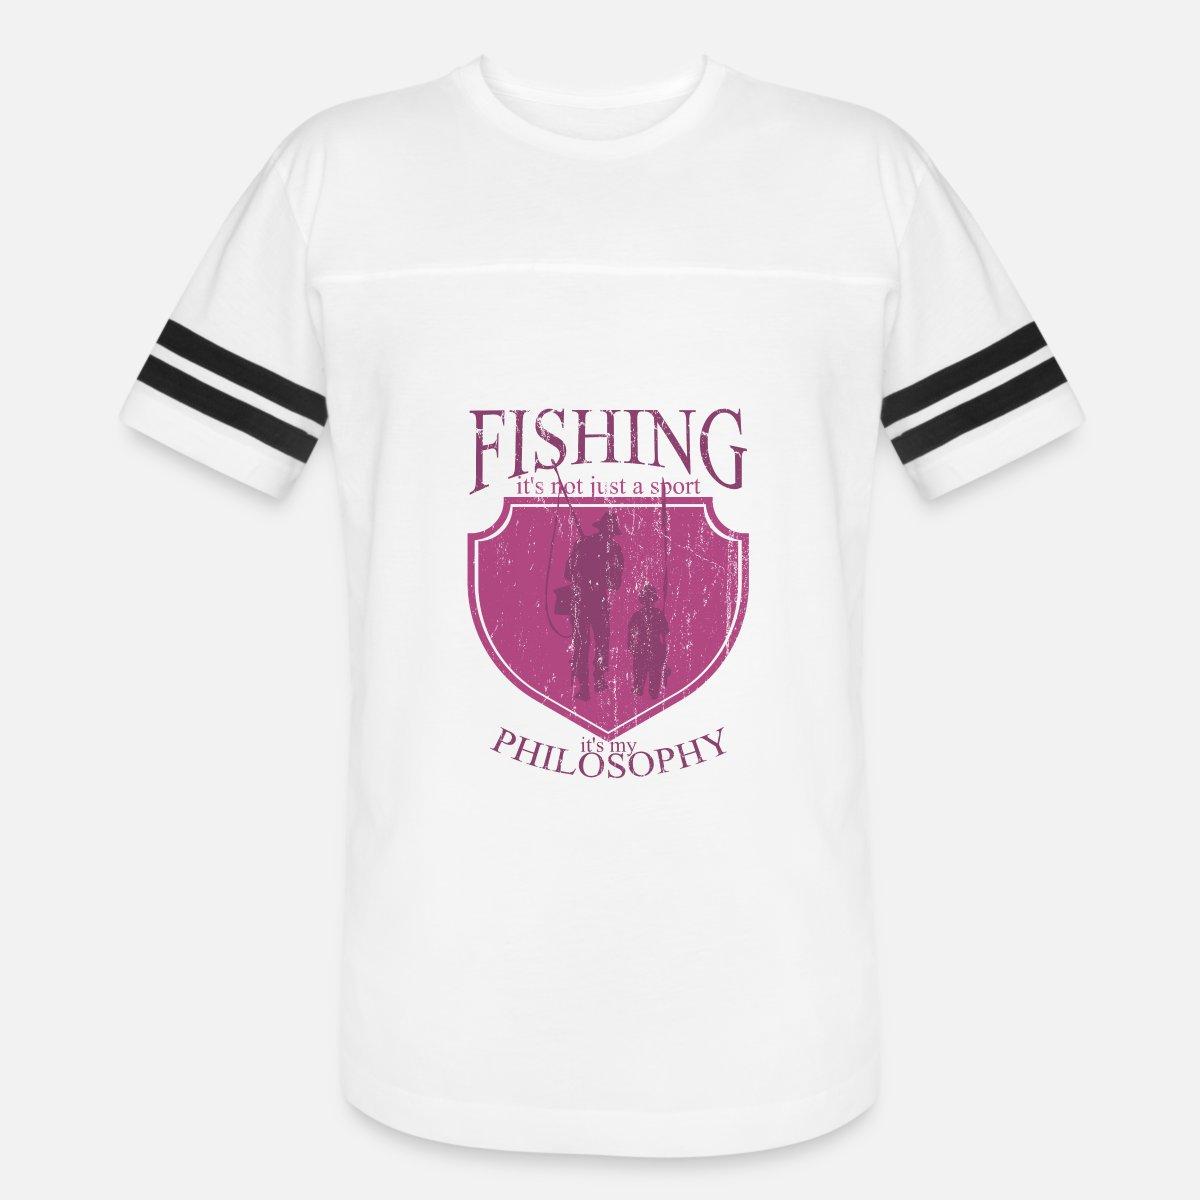 dde9328ad0 Cool Sports Sayings On T Shirts - DREAMWORKS